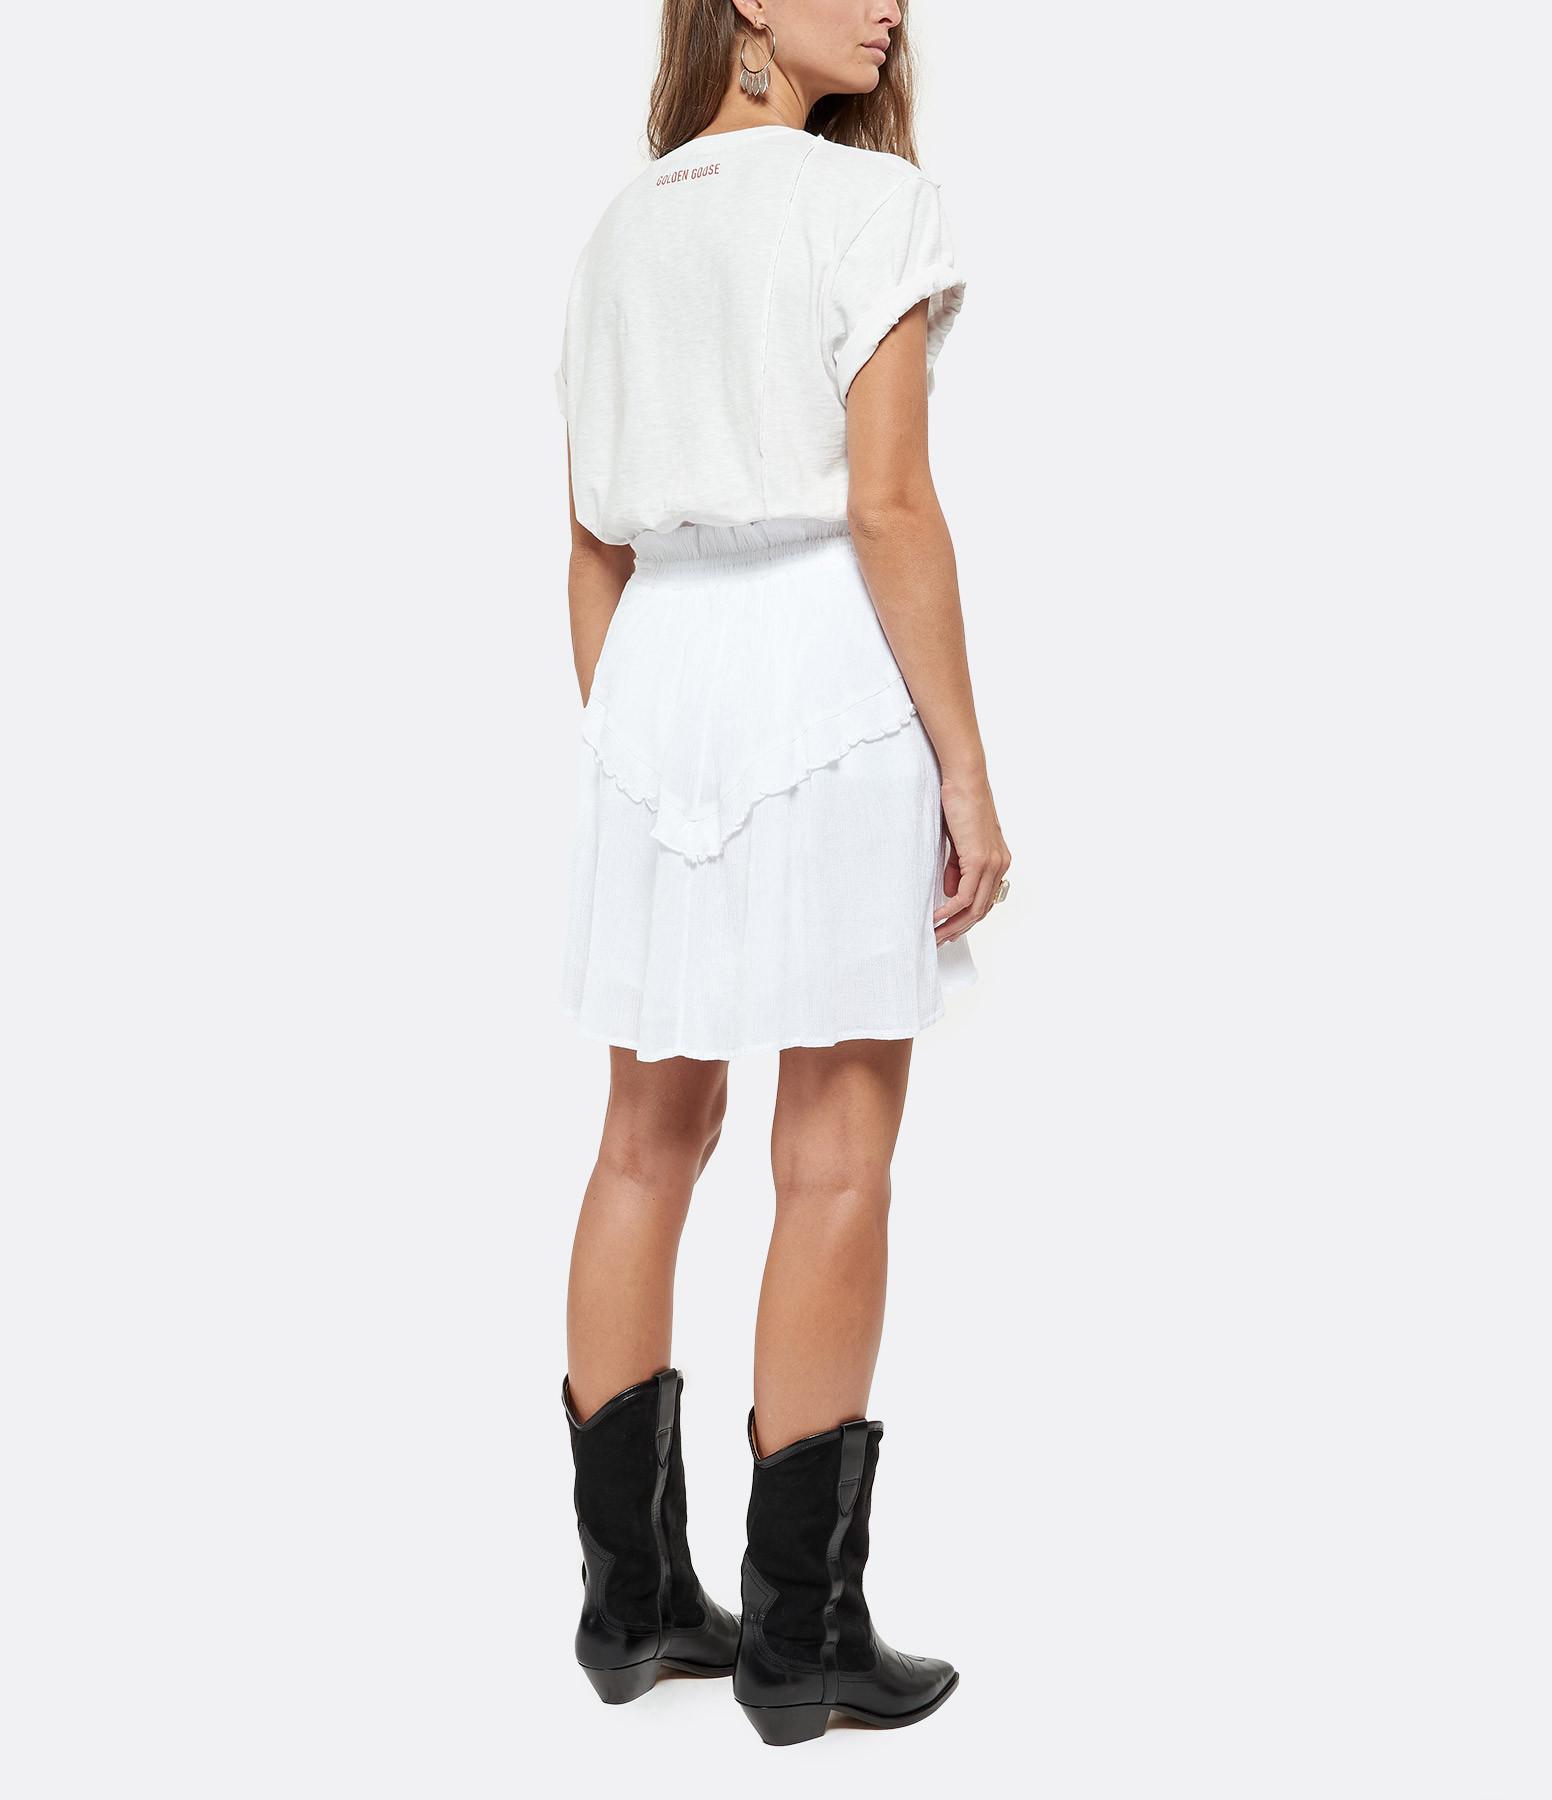 ISABEL MARANT ÉTOILE - Jupe Itelo Coton Blanc